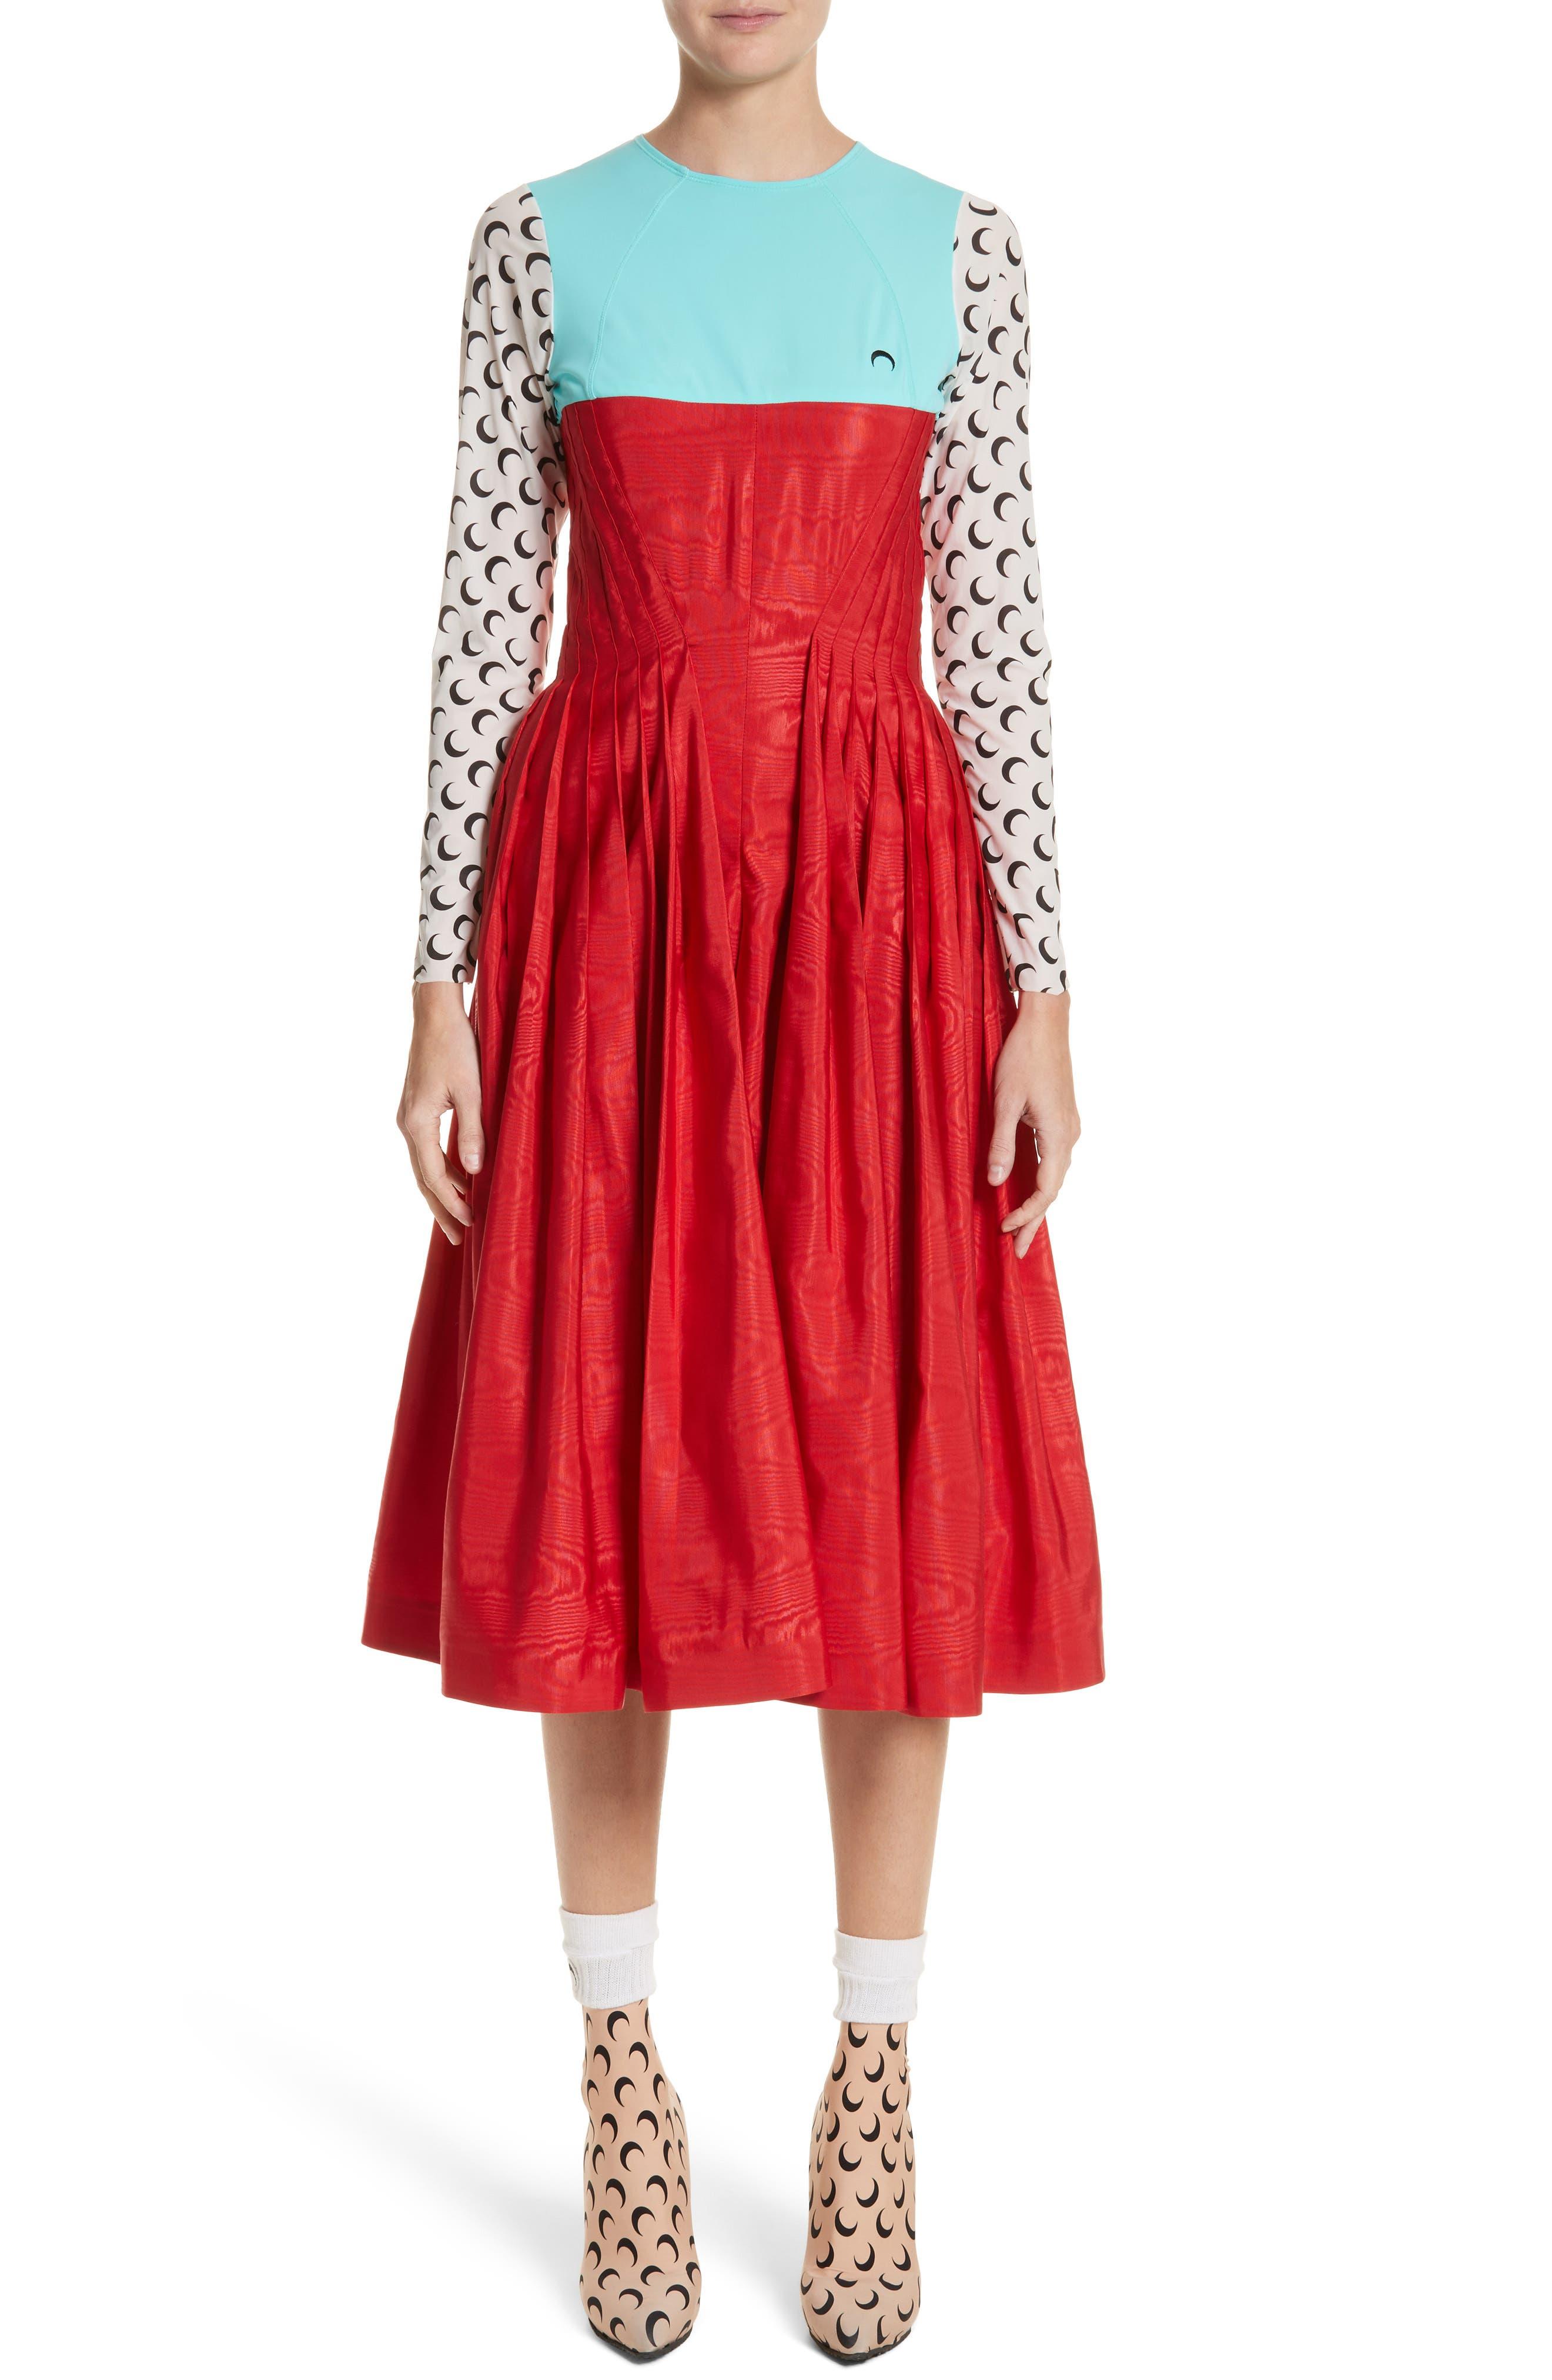 Hybrid Moiré Dress,                             Main thumbnail 1, color,                             Turquoise/ Red